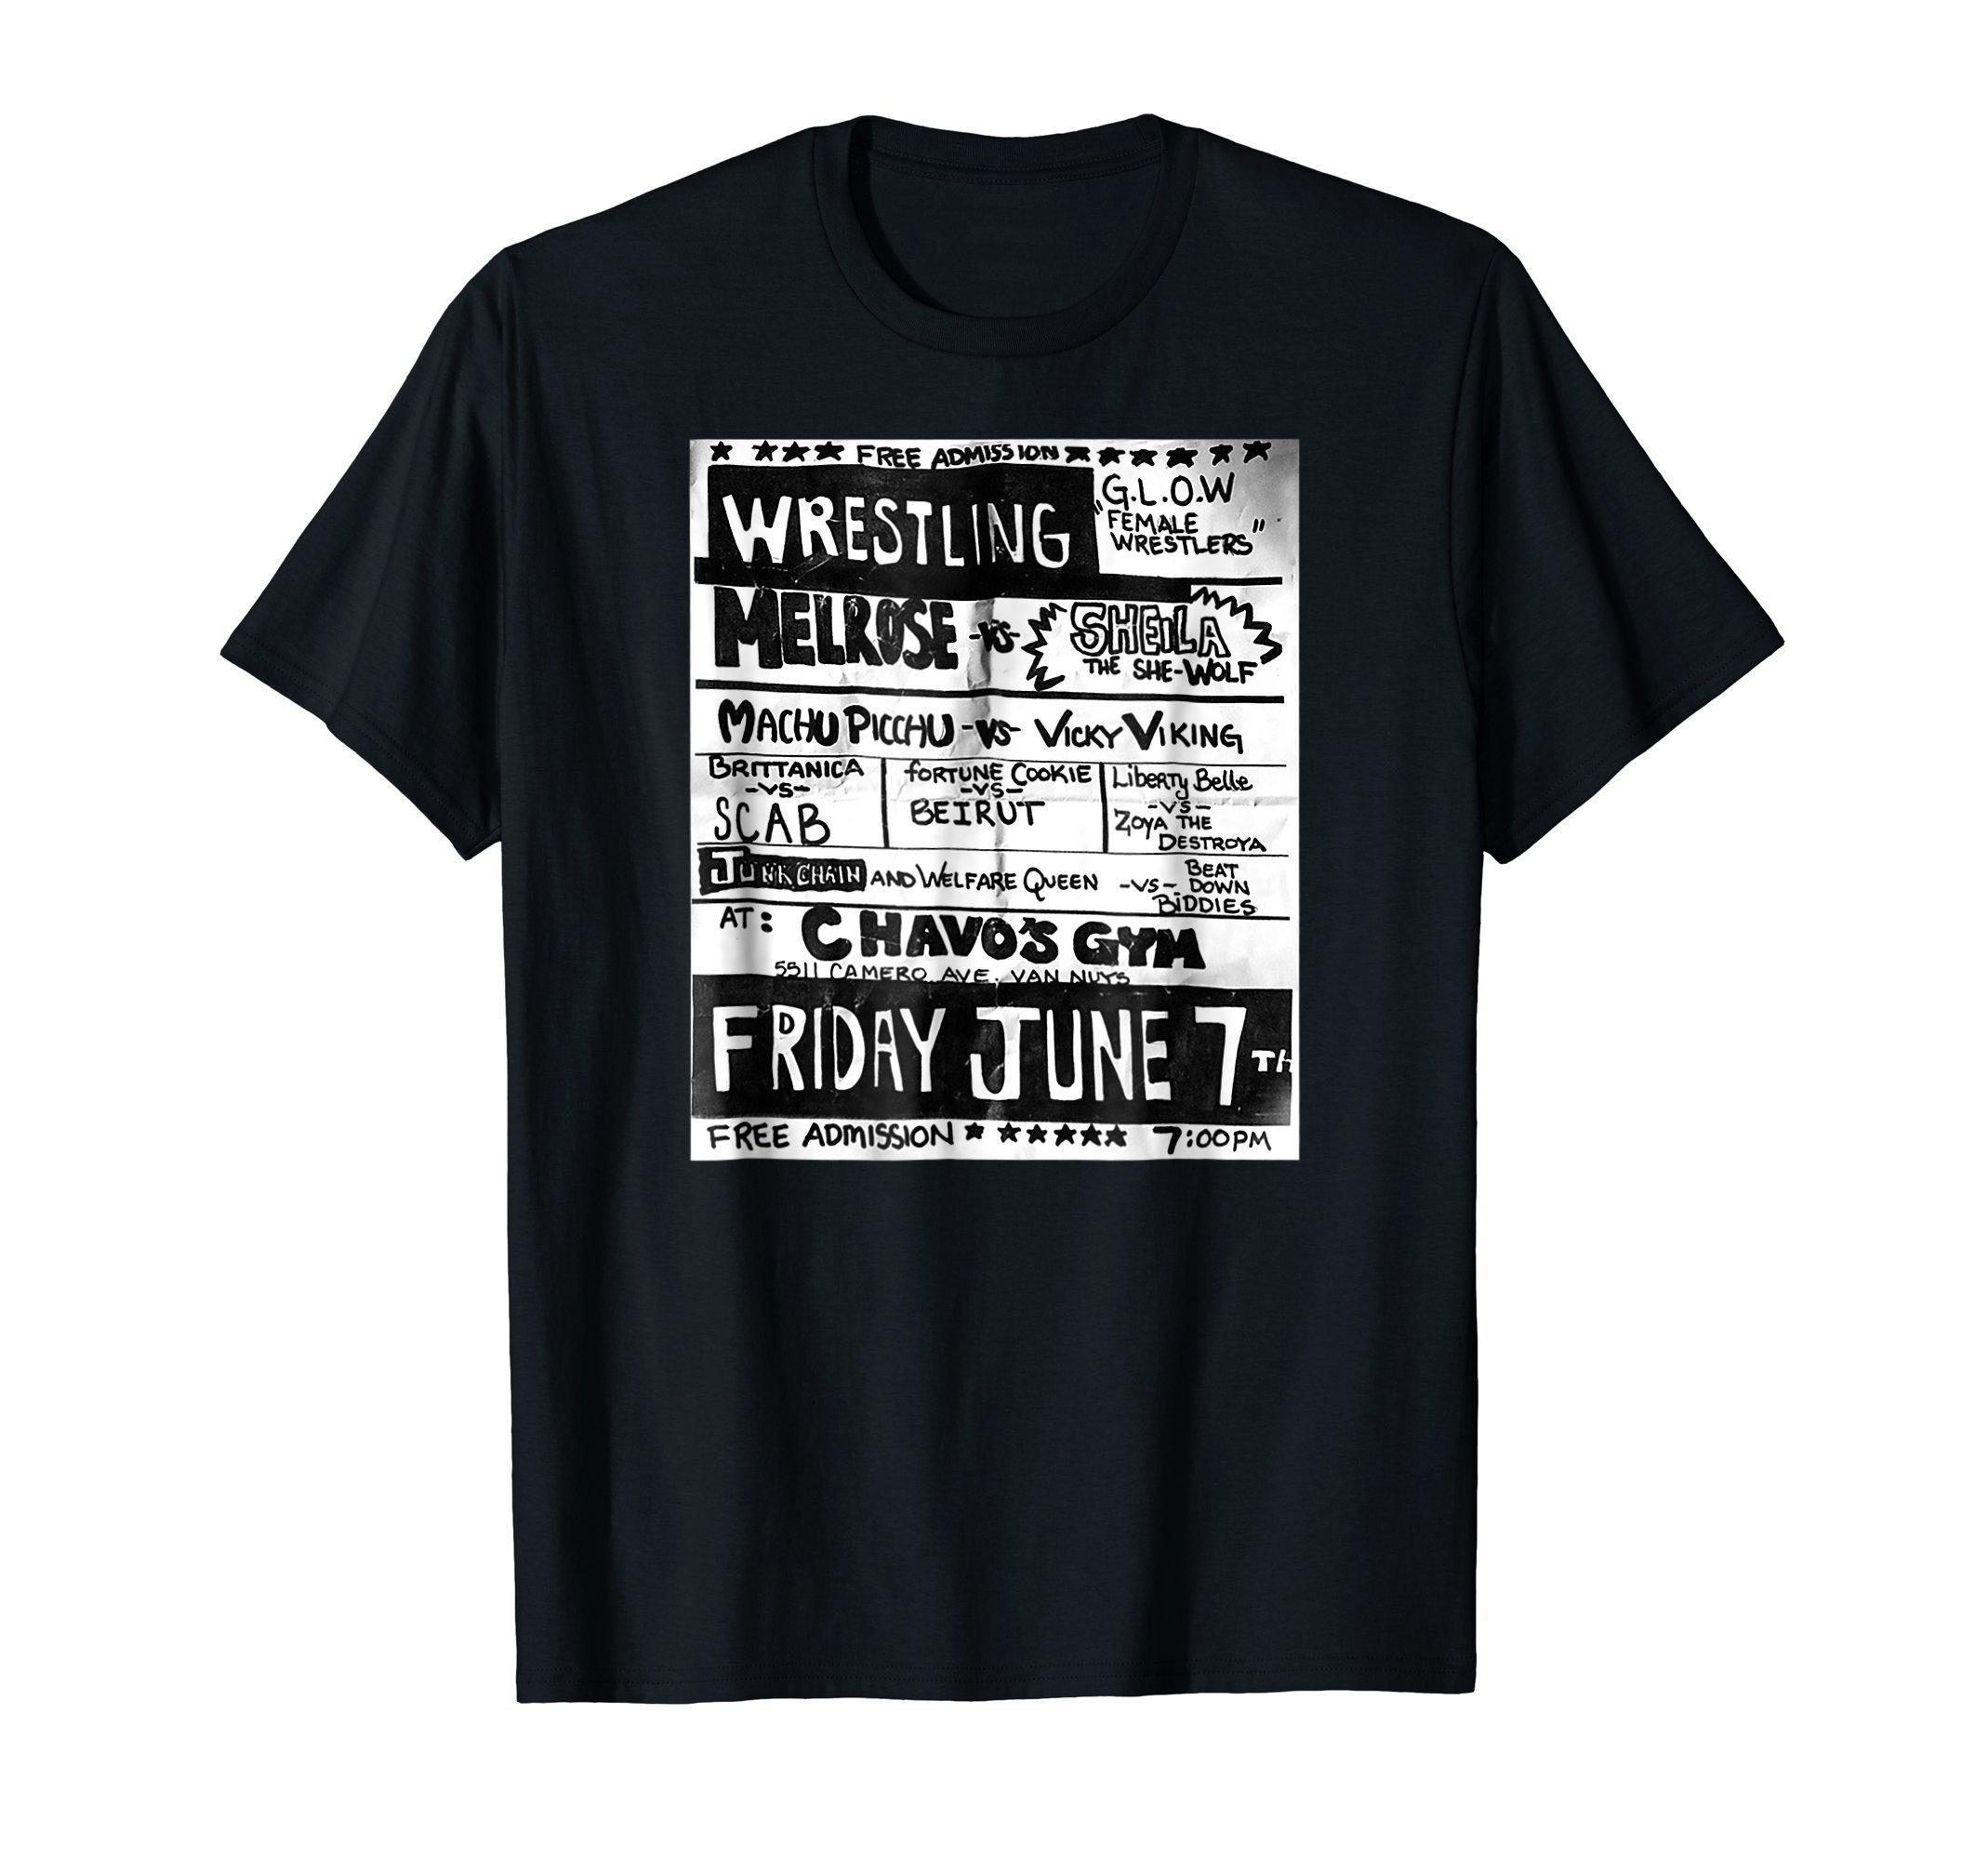 Netflix Glow Wrestling Poster T-shirt